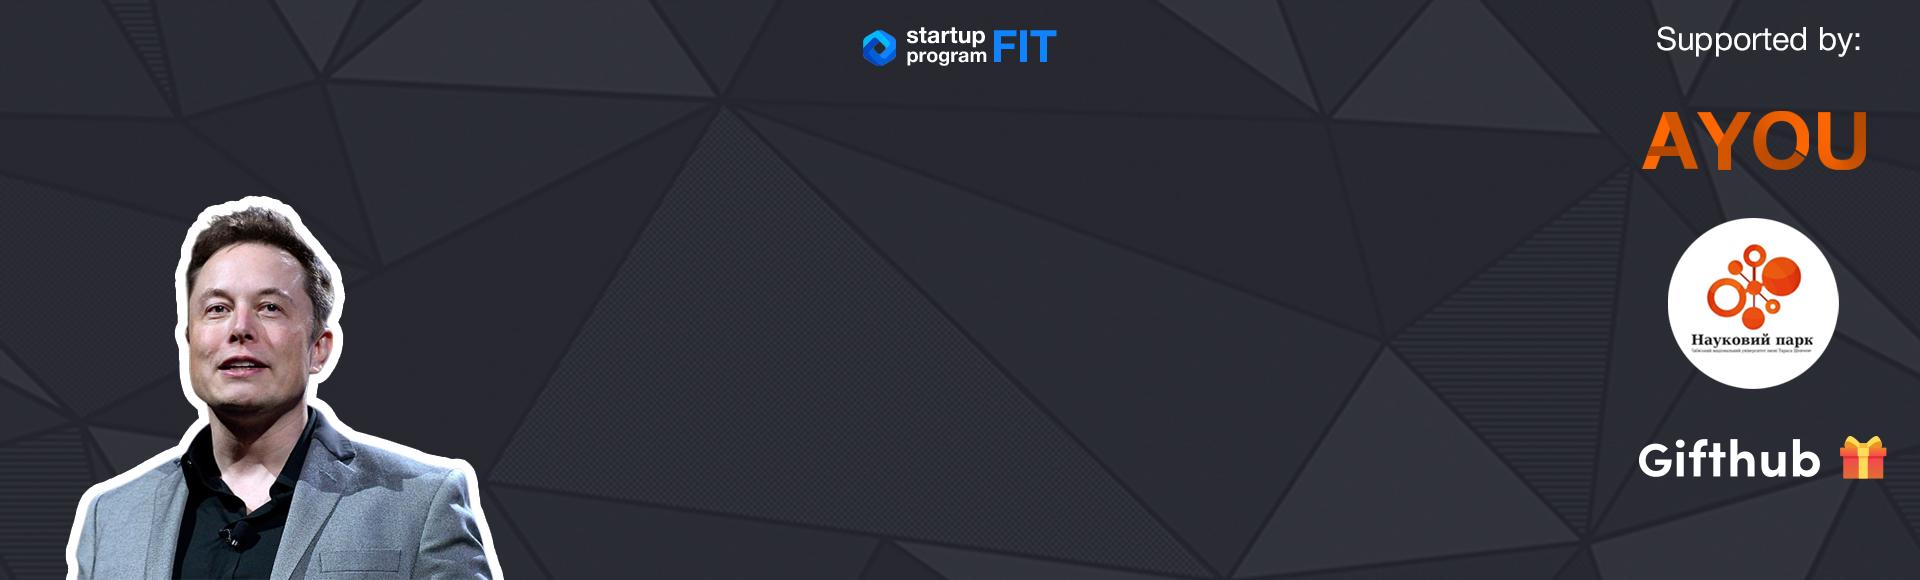 Startup програма FIT